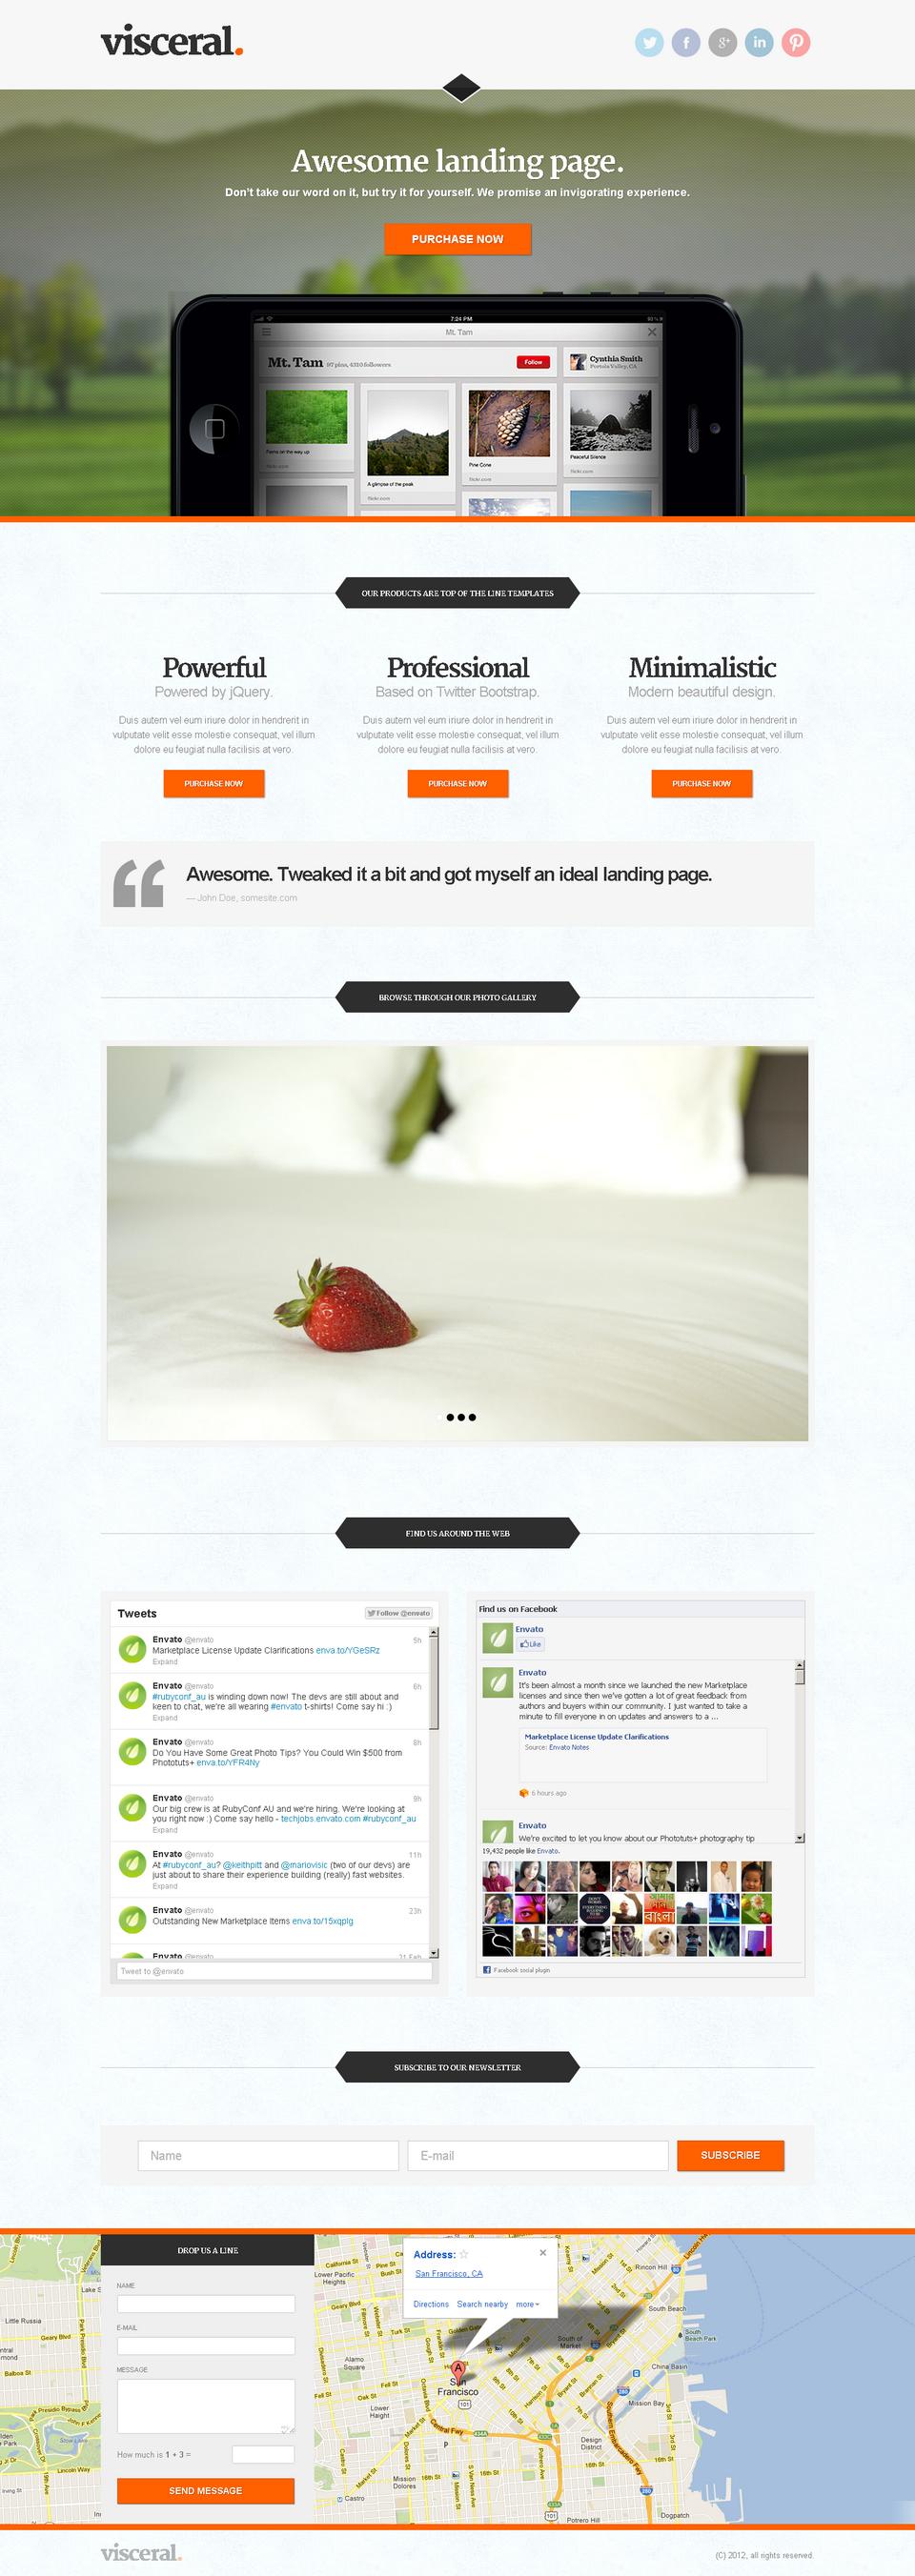 Visceral - Premium Multipurpose Landing Page - Visceral - black iPhone layout, orange theme